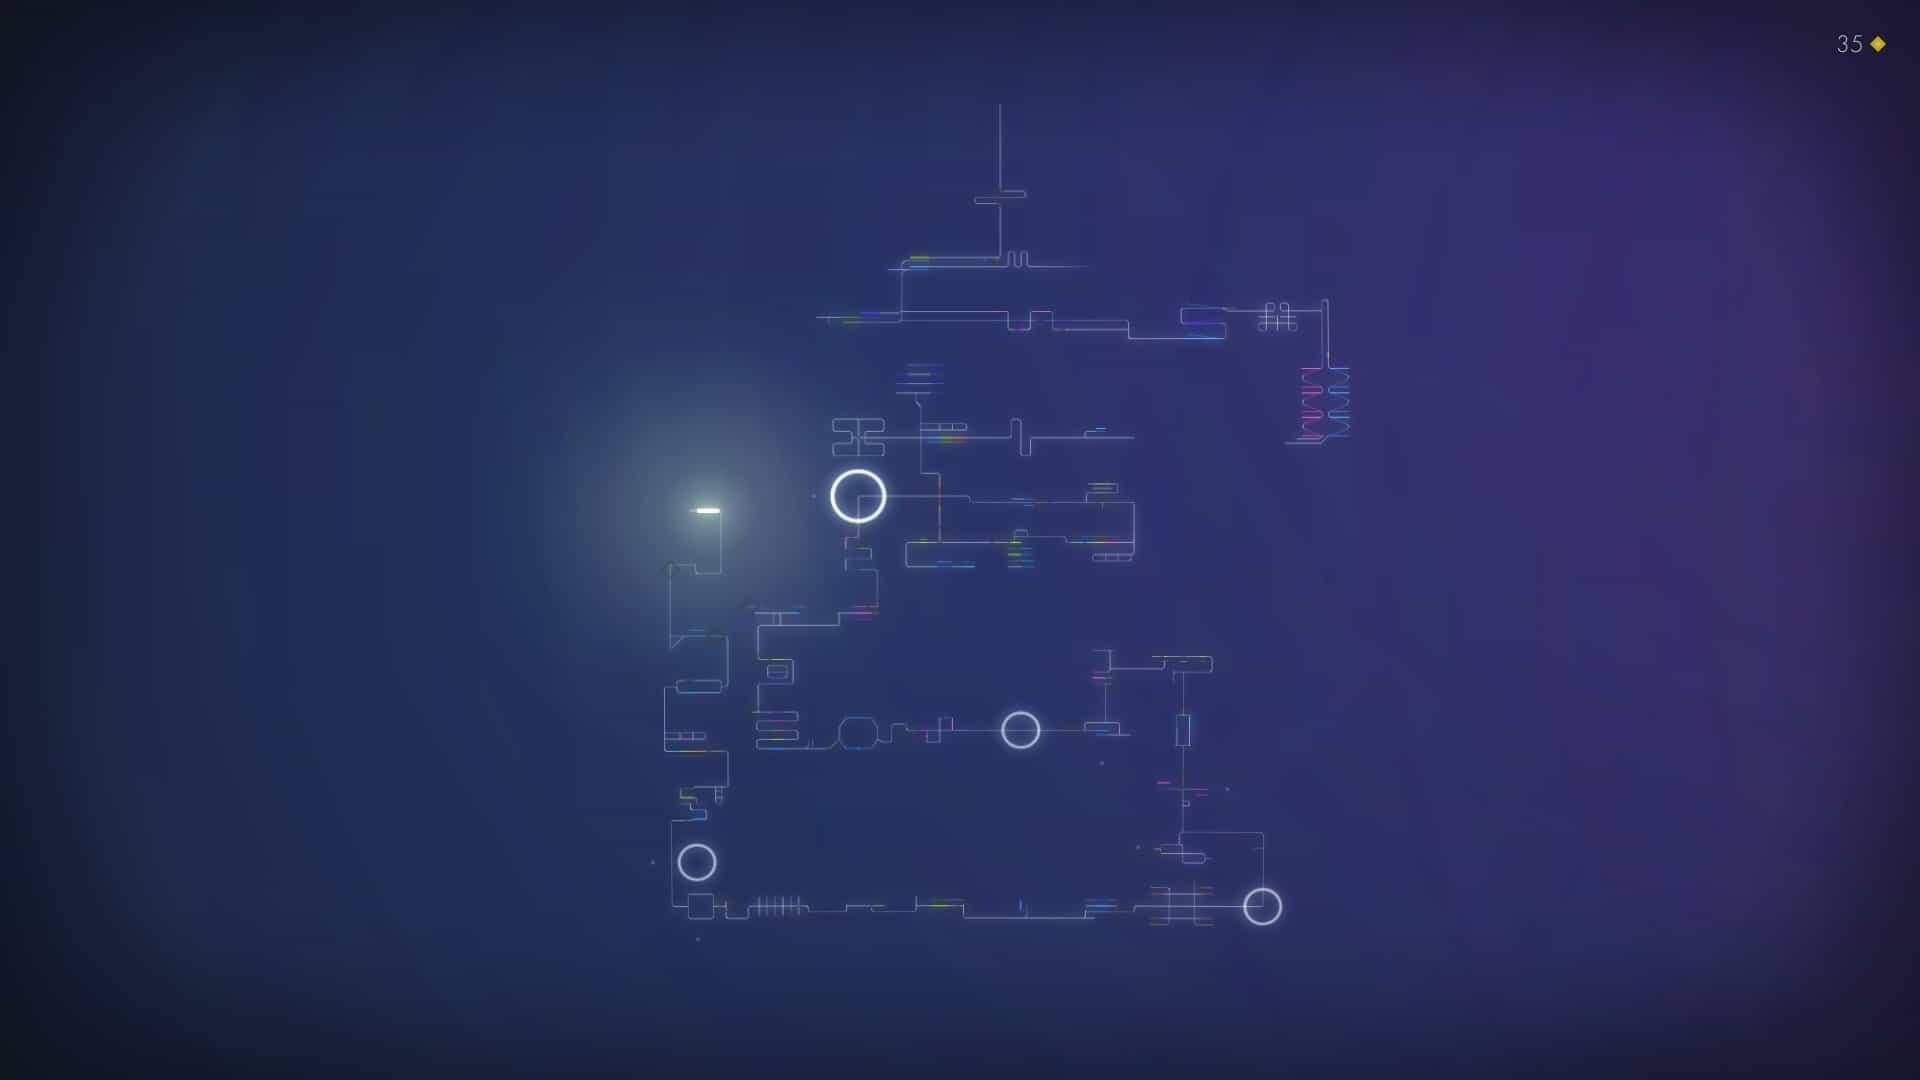 Linelight game screenshot, level selection